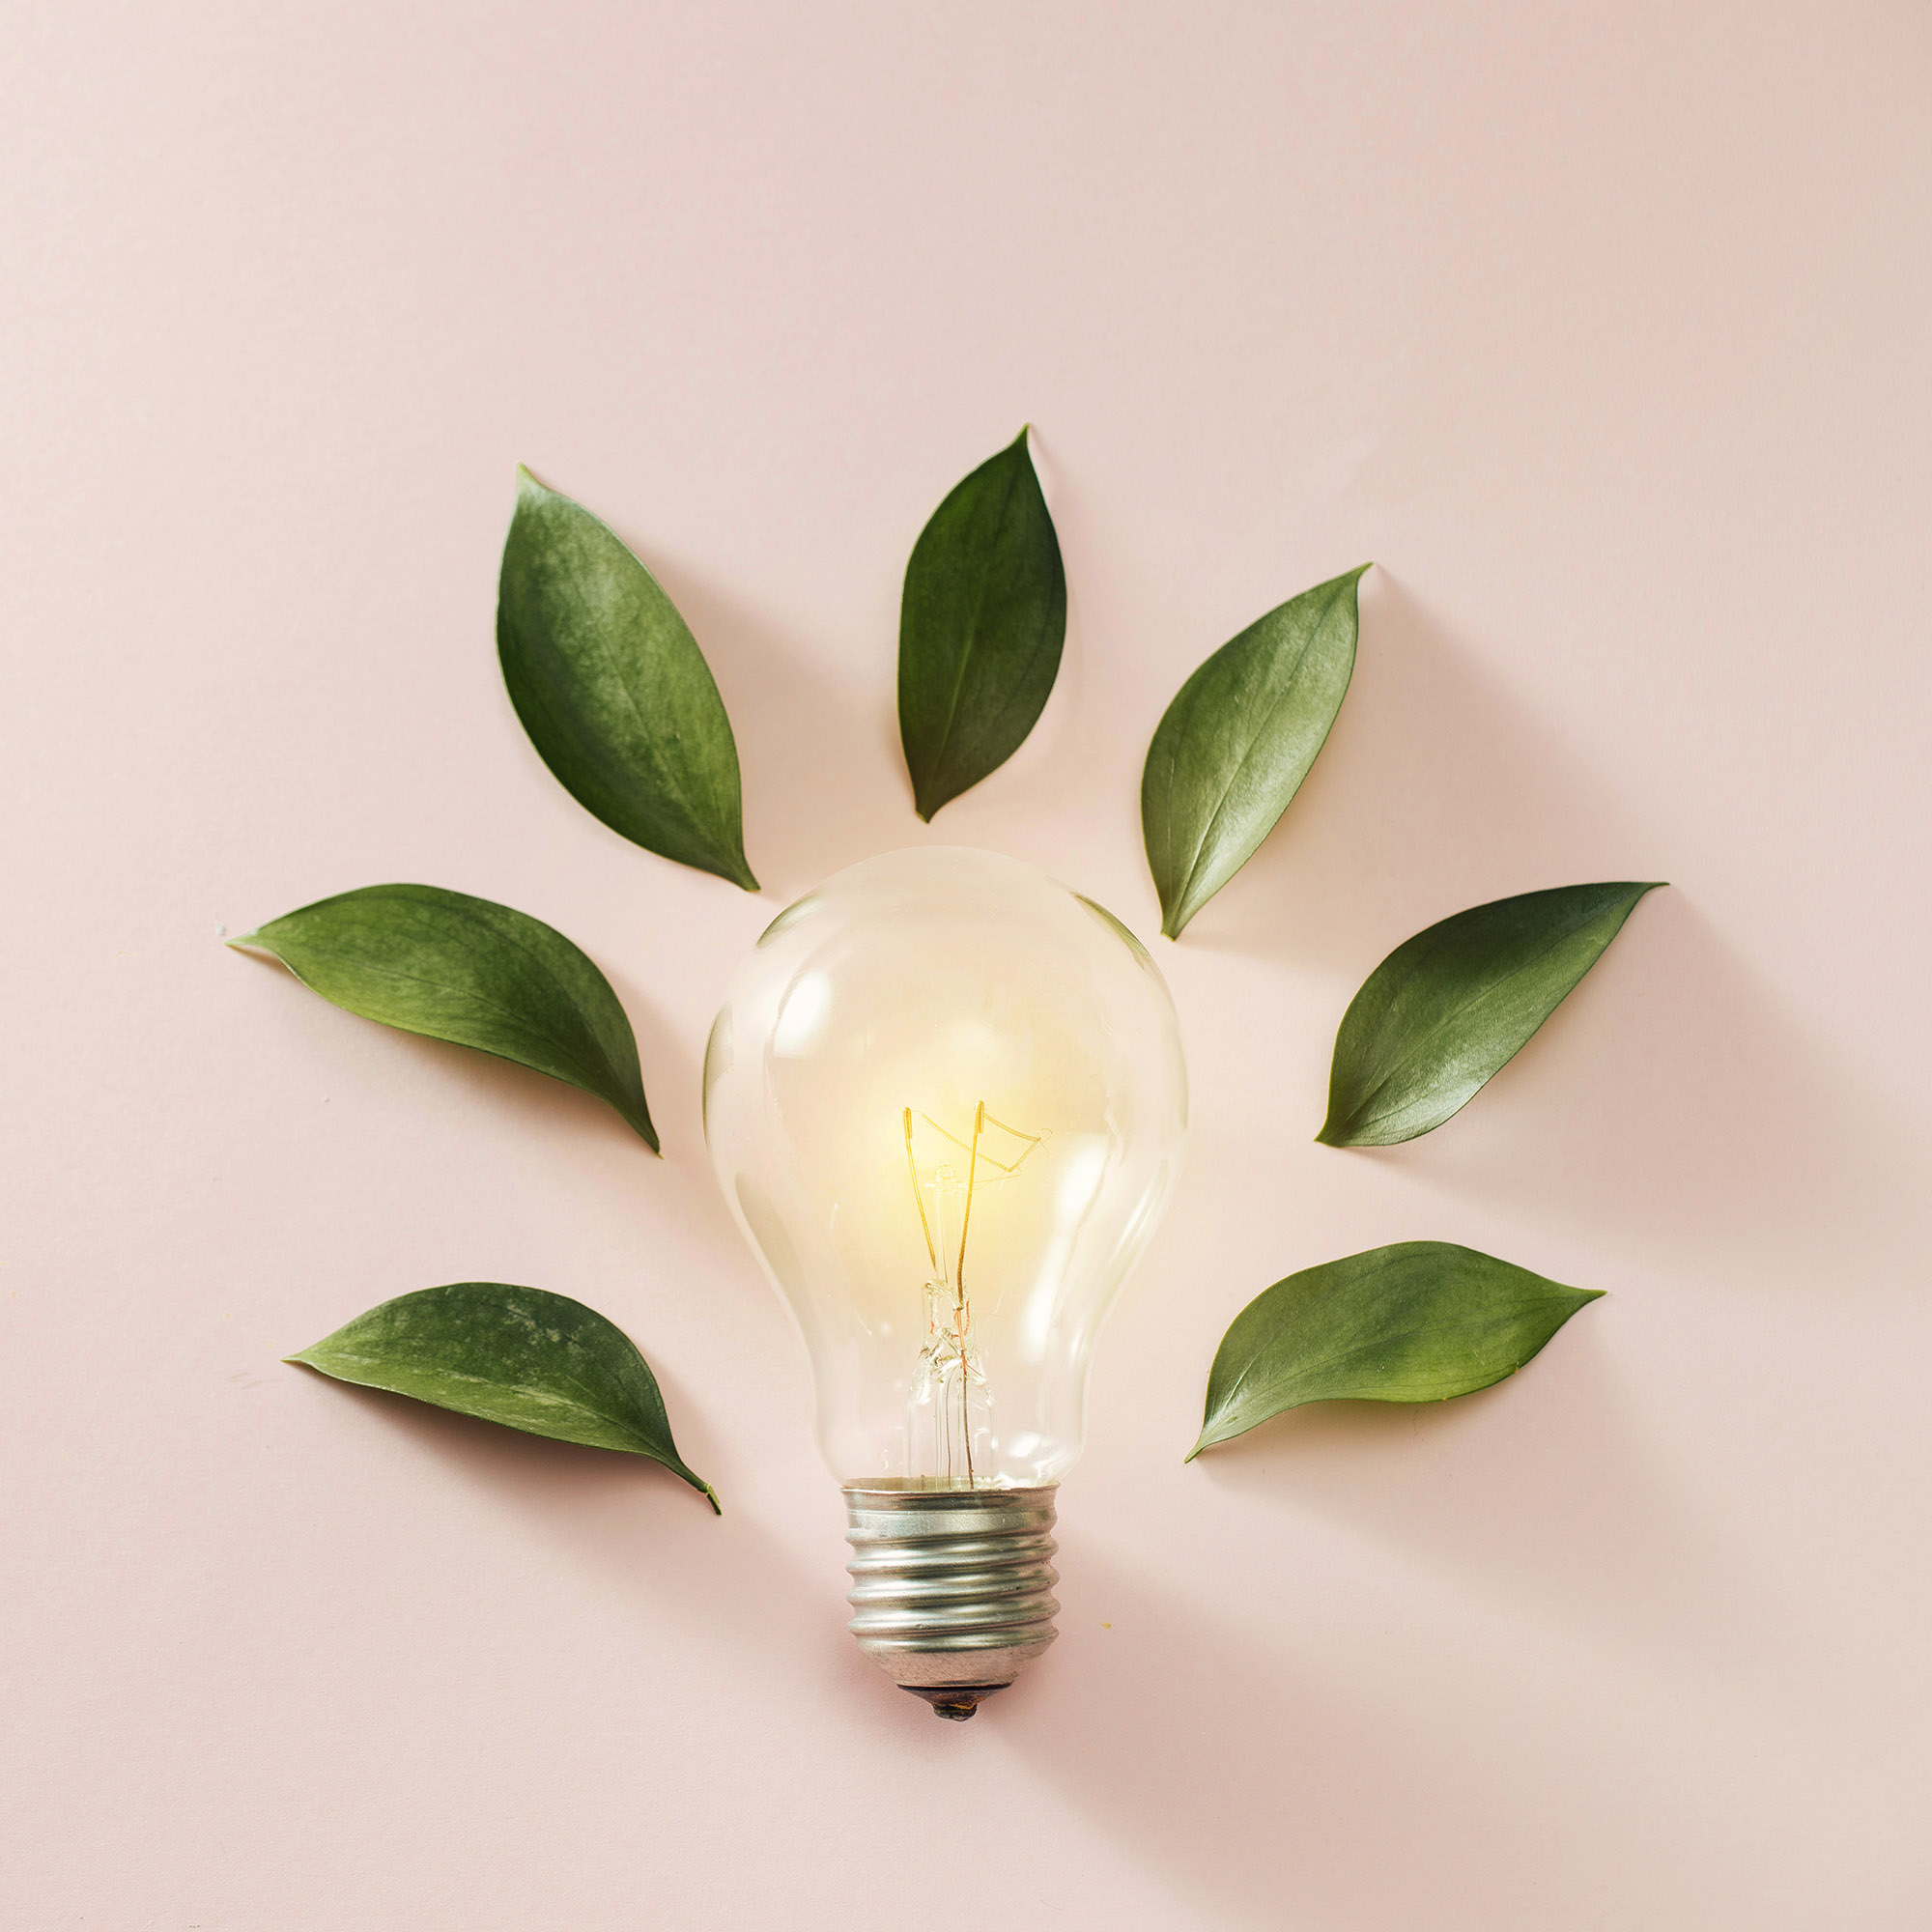 eco green energy concept bulb, lightbulb leaves on pink background